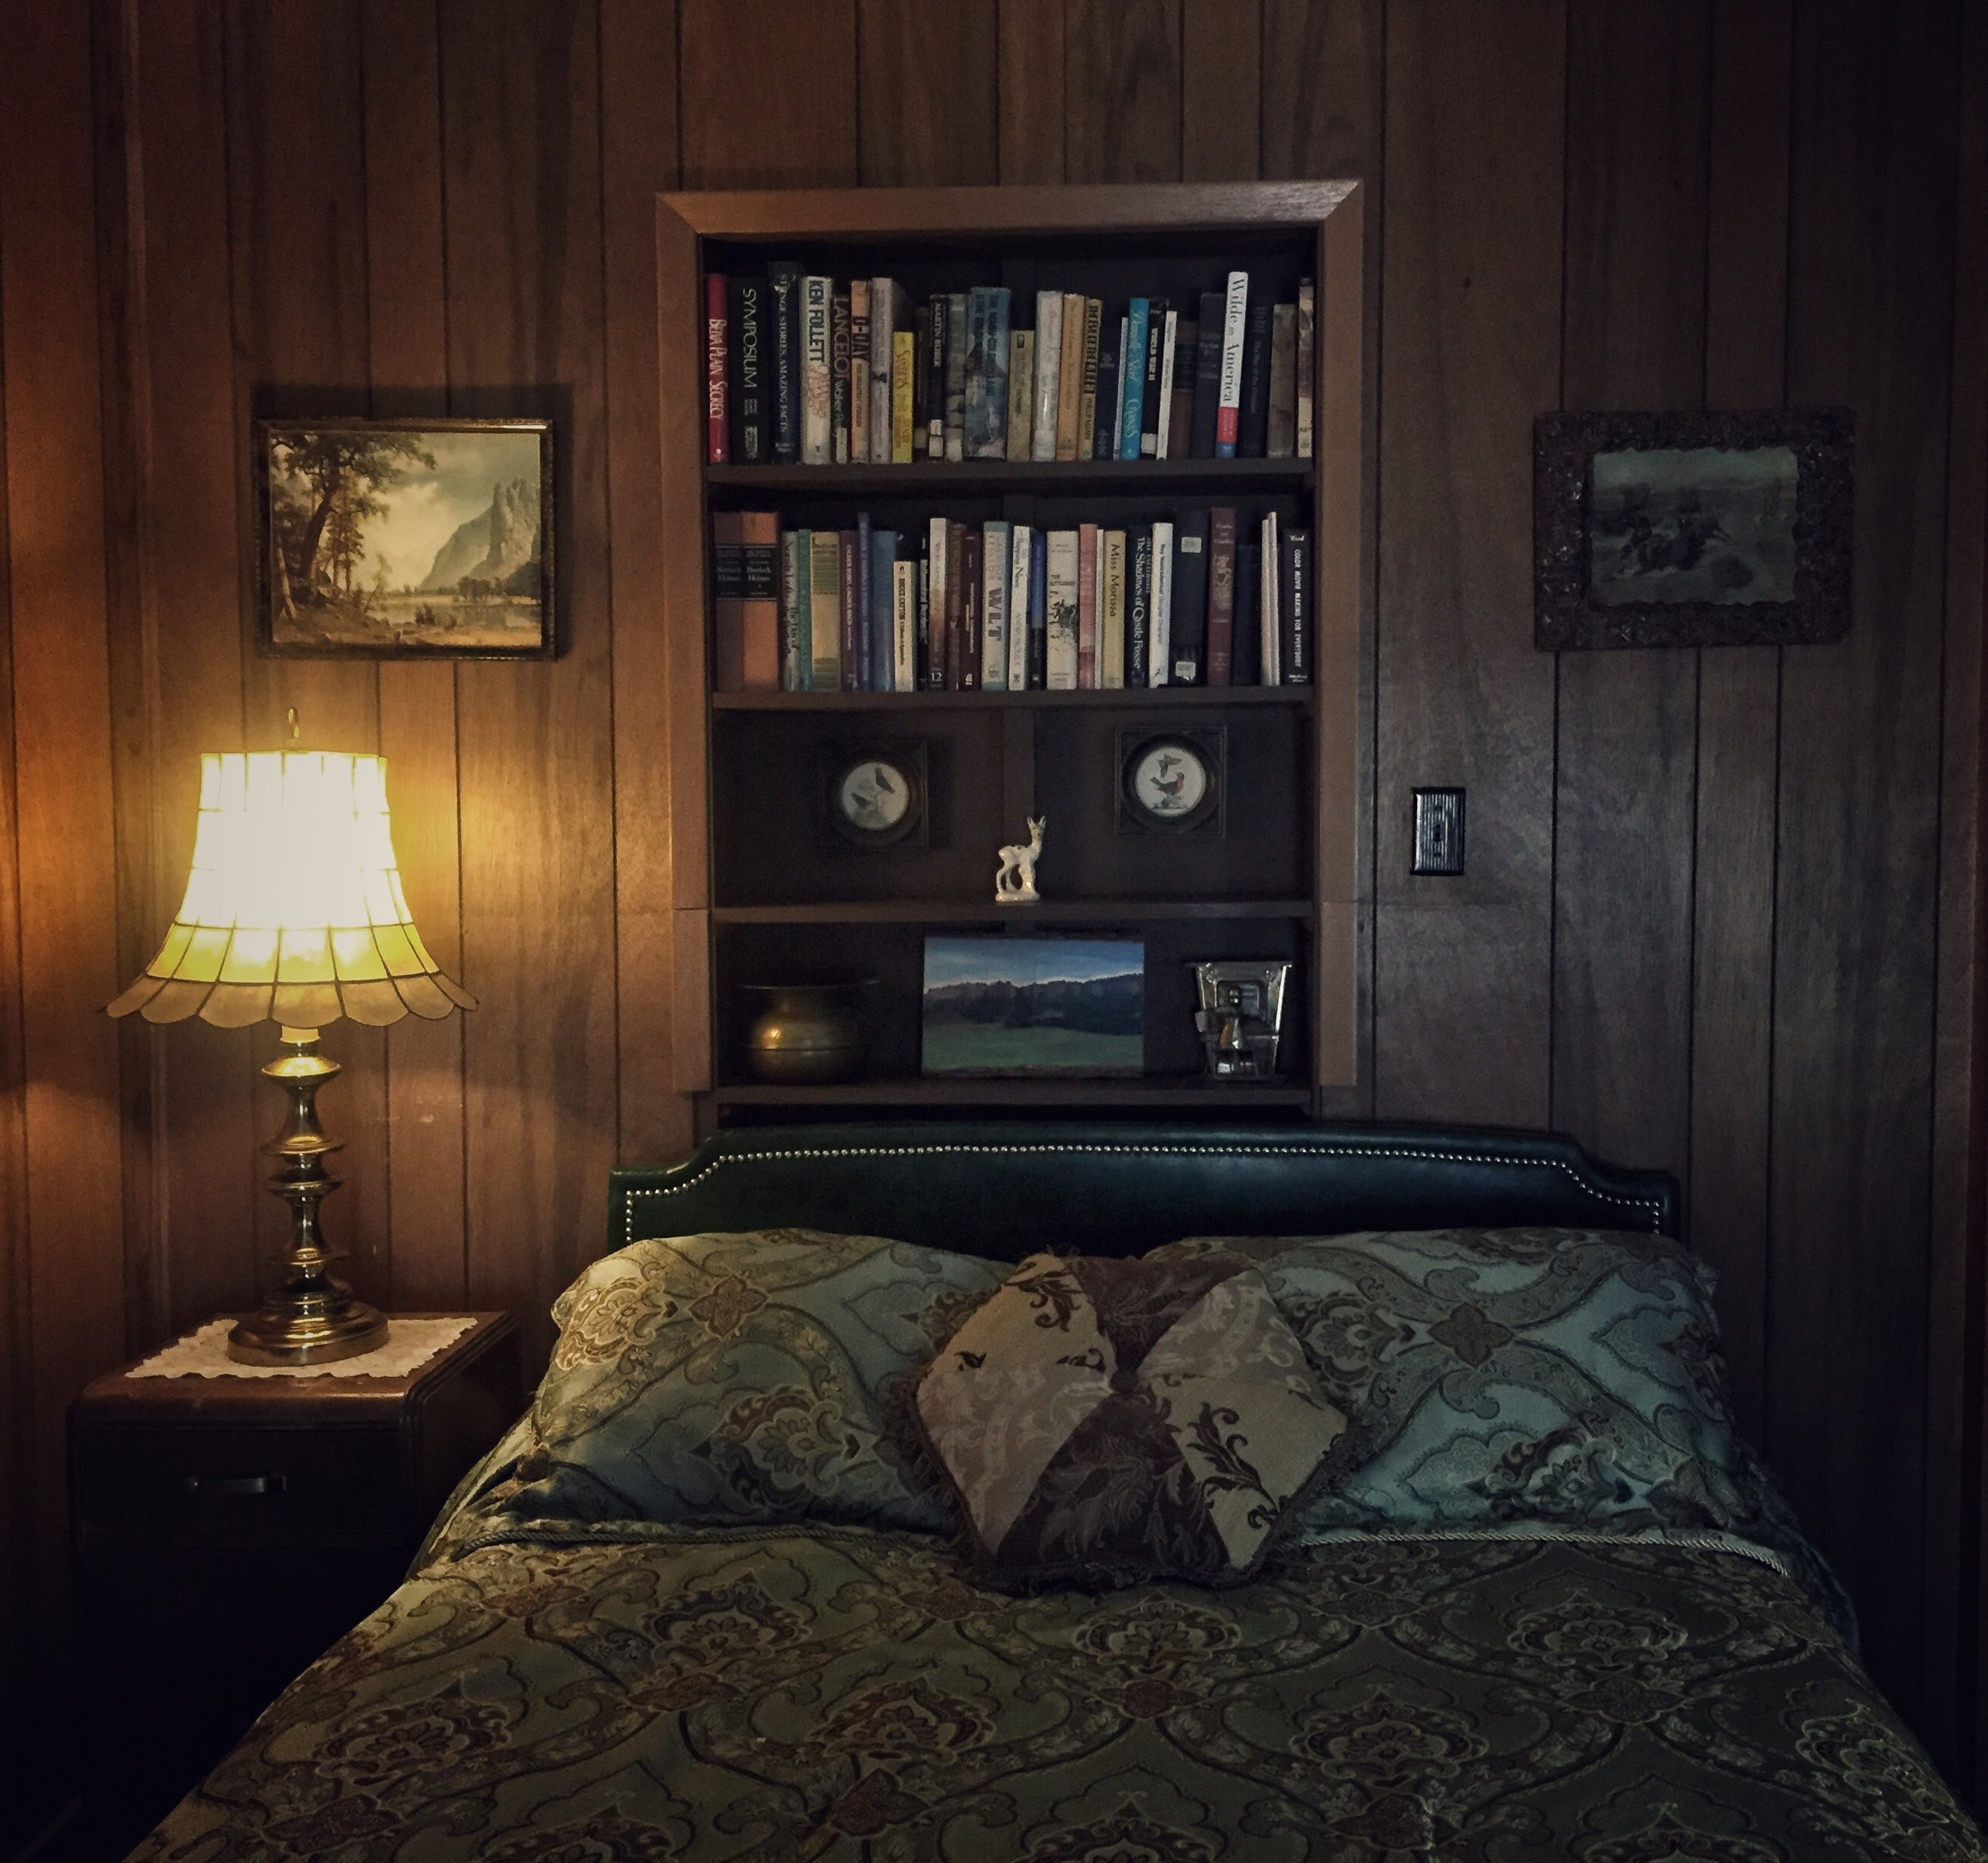 My room last night - The Mari Sandoz Suite at the Olde Main Street Inn in Chadron, NE.